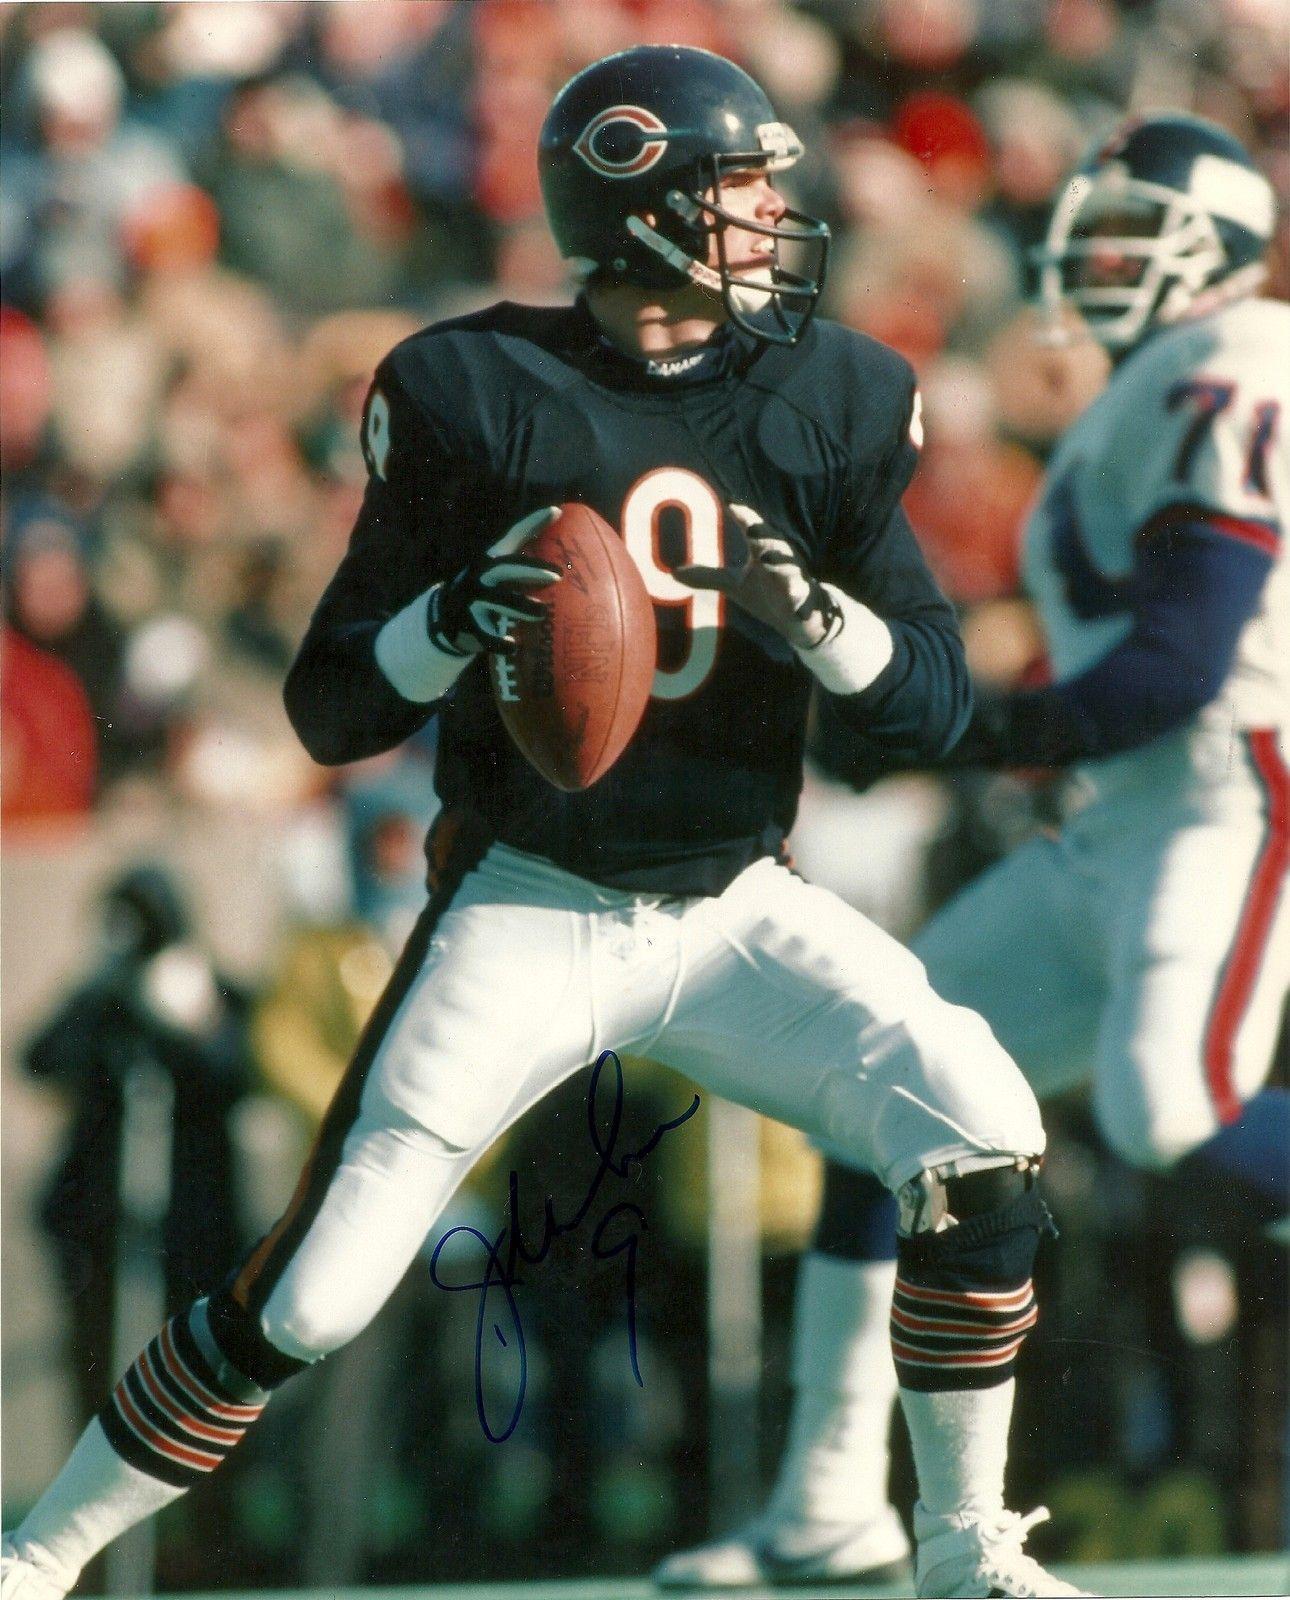 Jim Mcmahon 9 Chicago Bears Qb Chicago Bears Football Chicago Sports Teams Bears Football